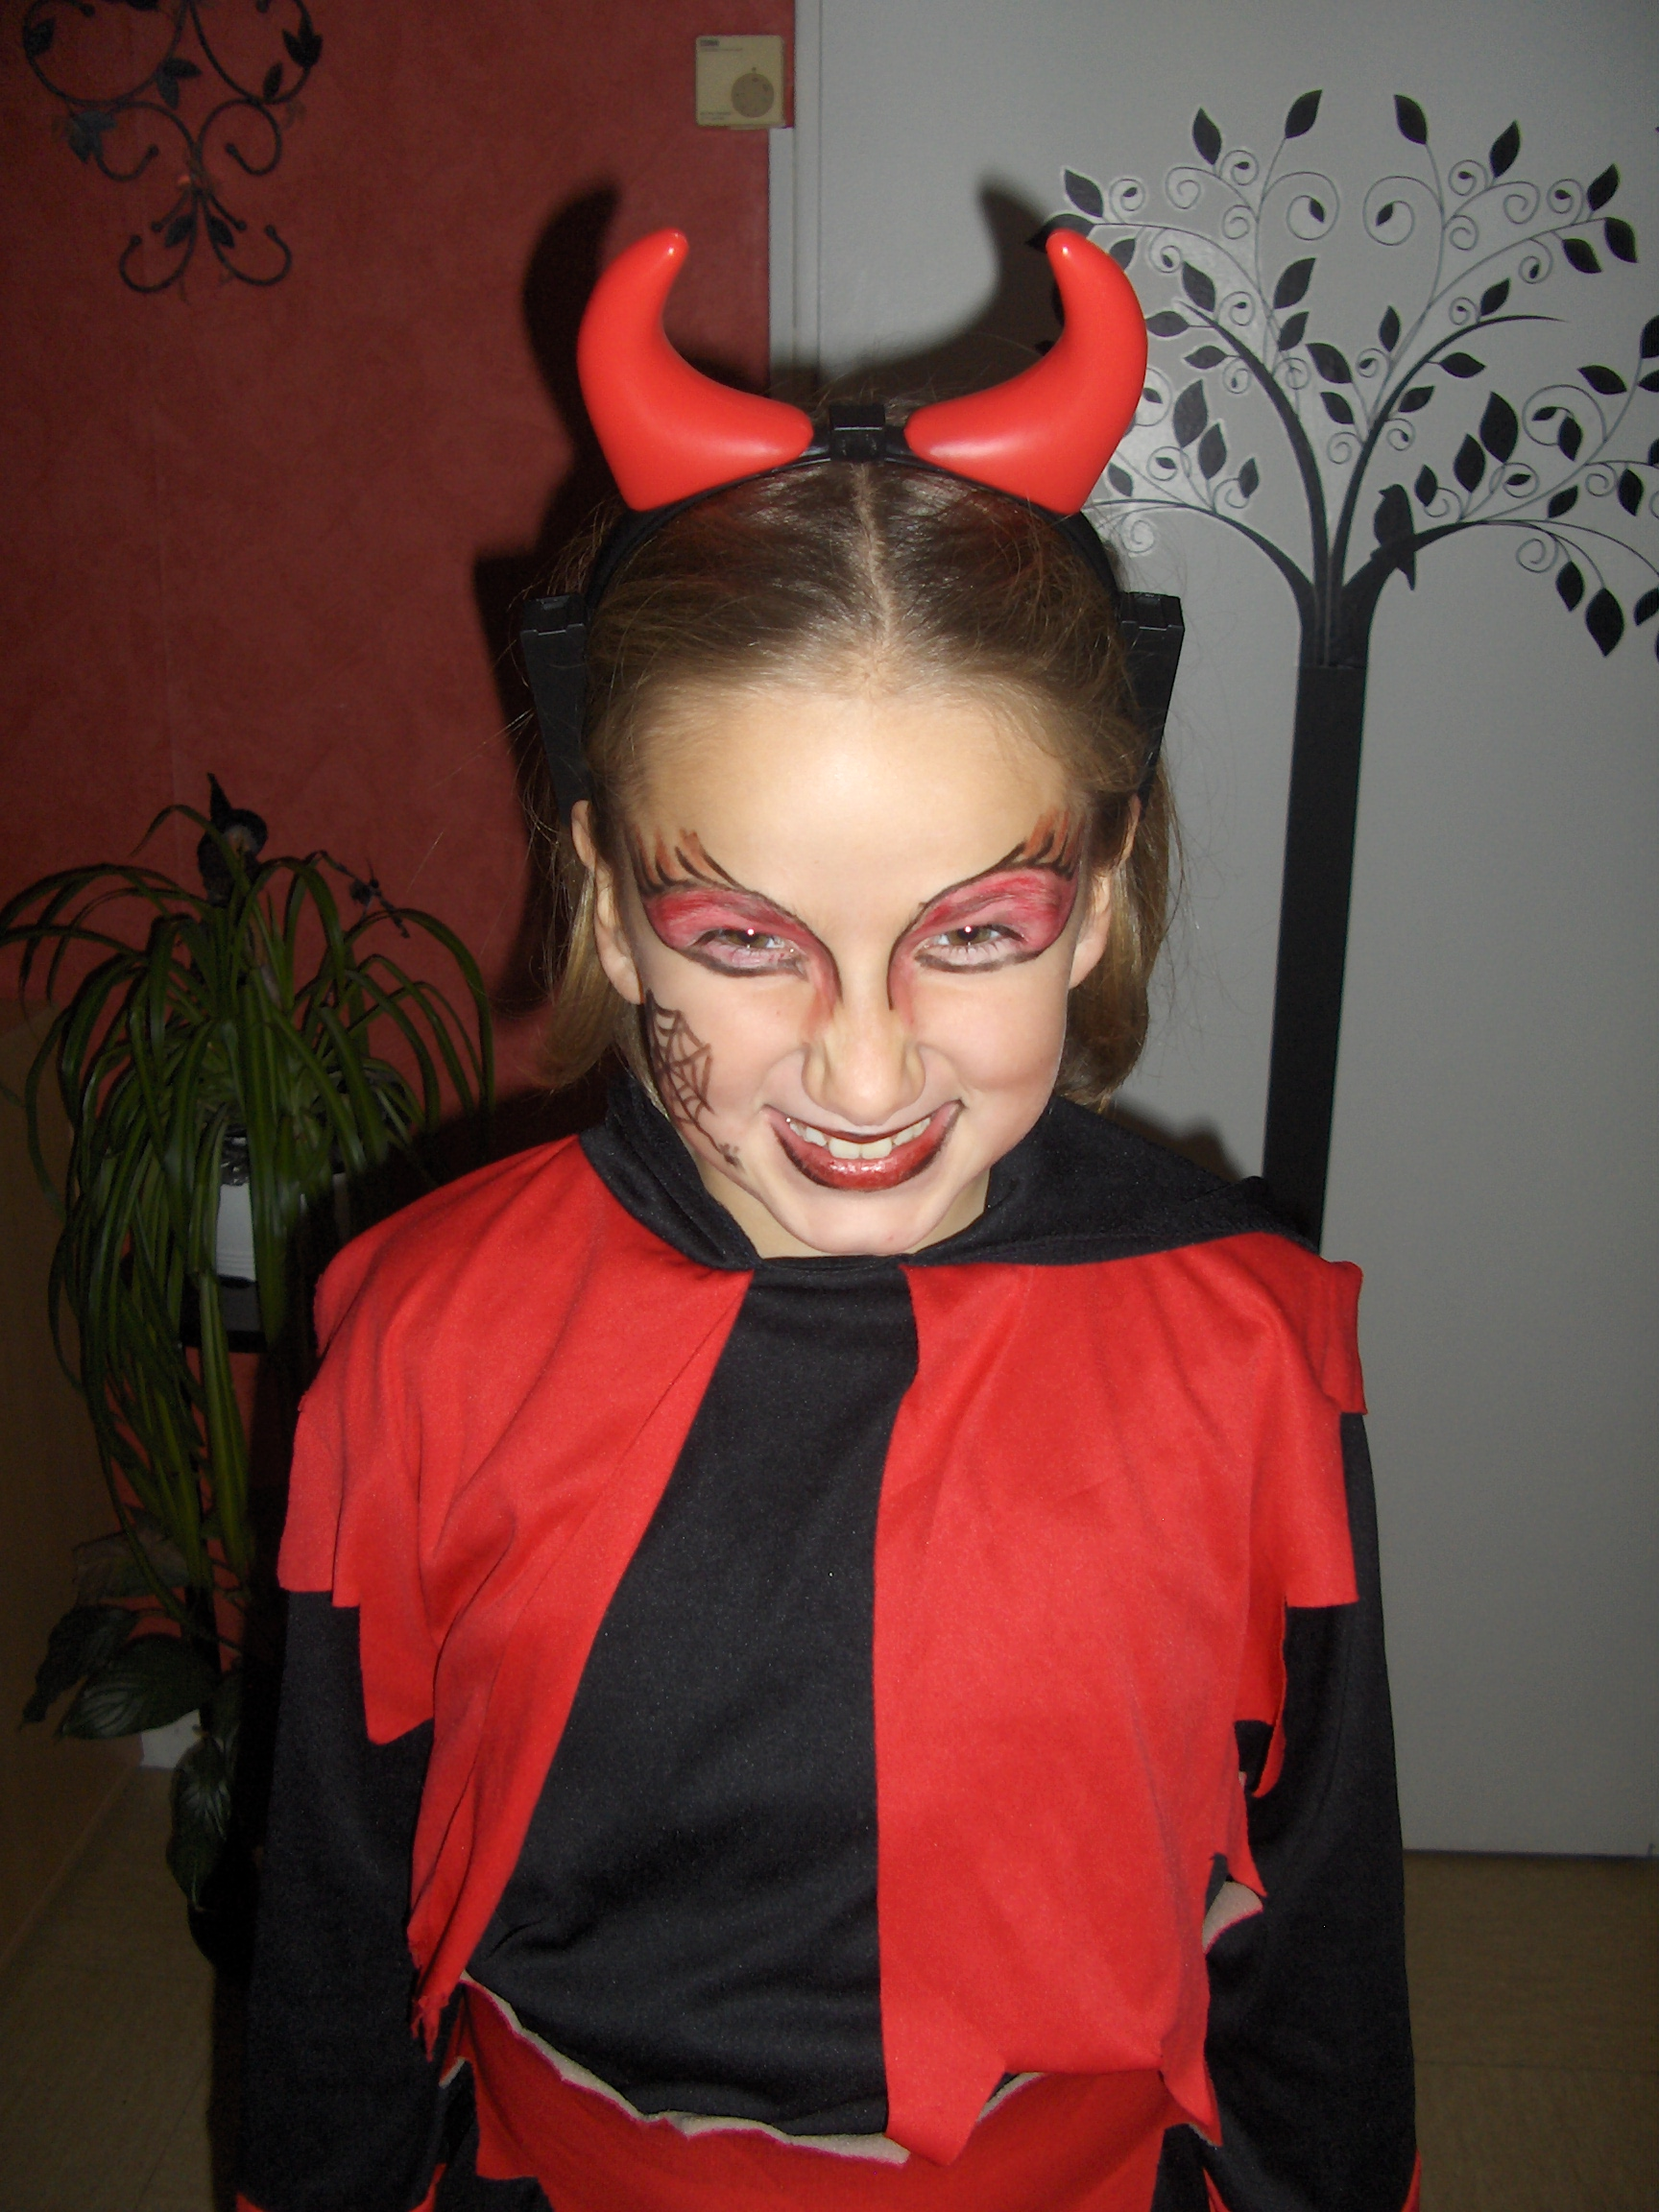 maquillage simple vampire petite fille. Black Bedroom Furniture Sets. Home Design Ideas